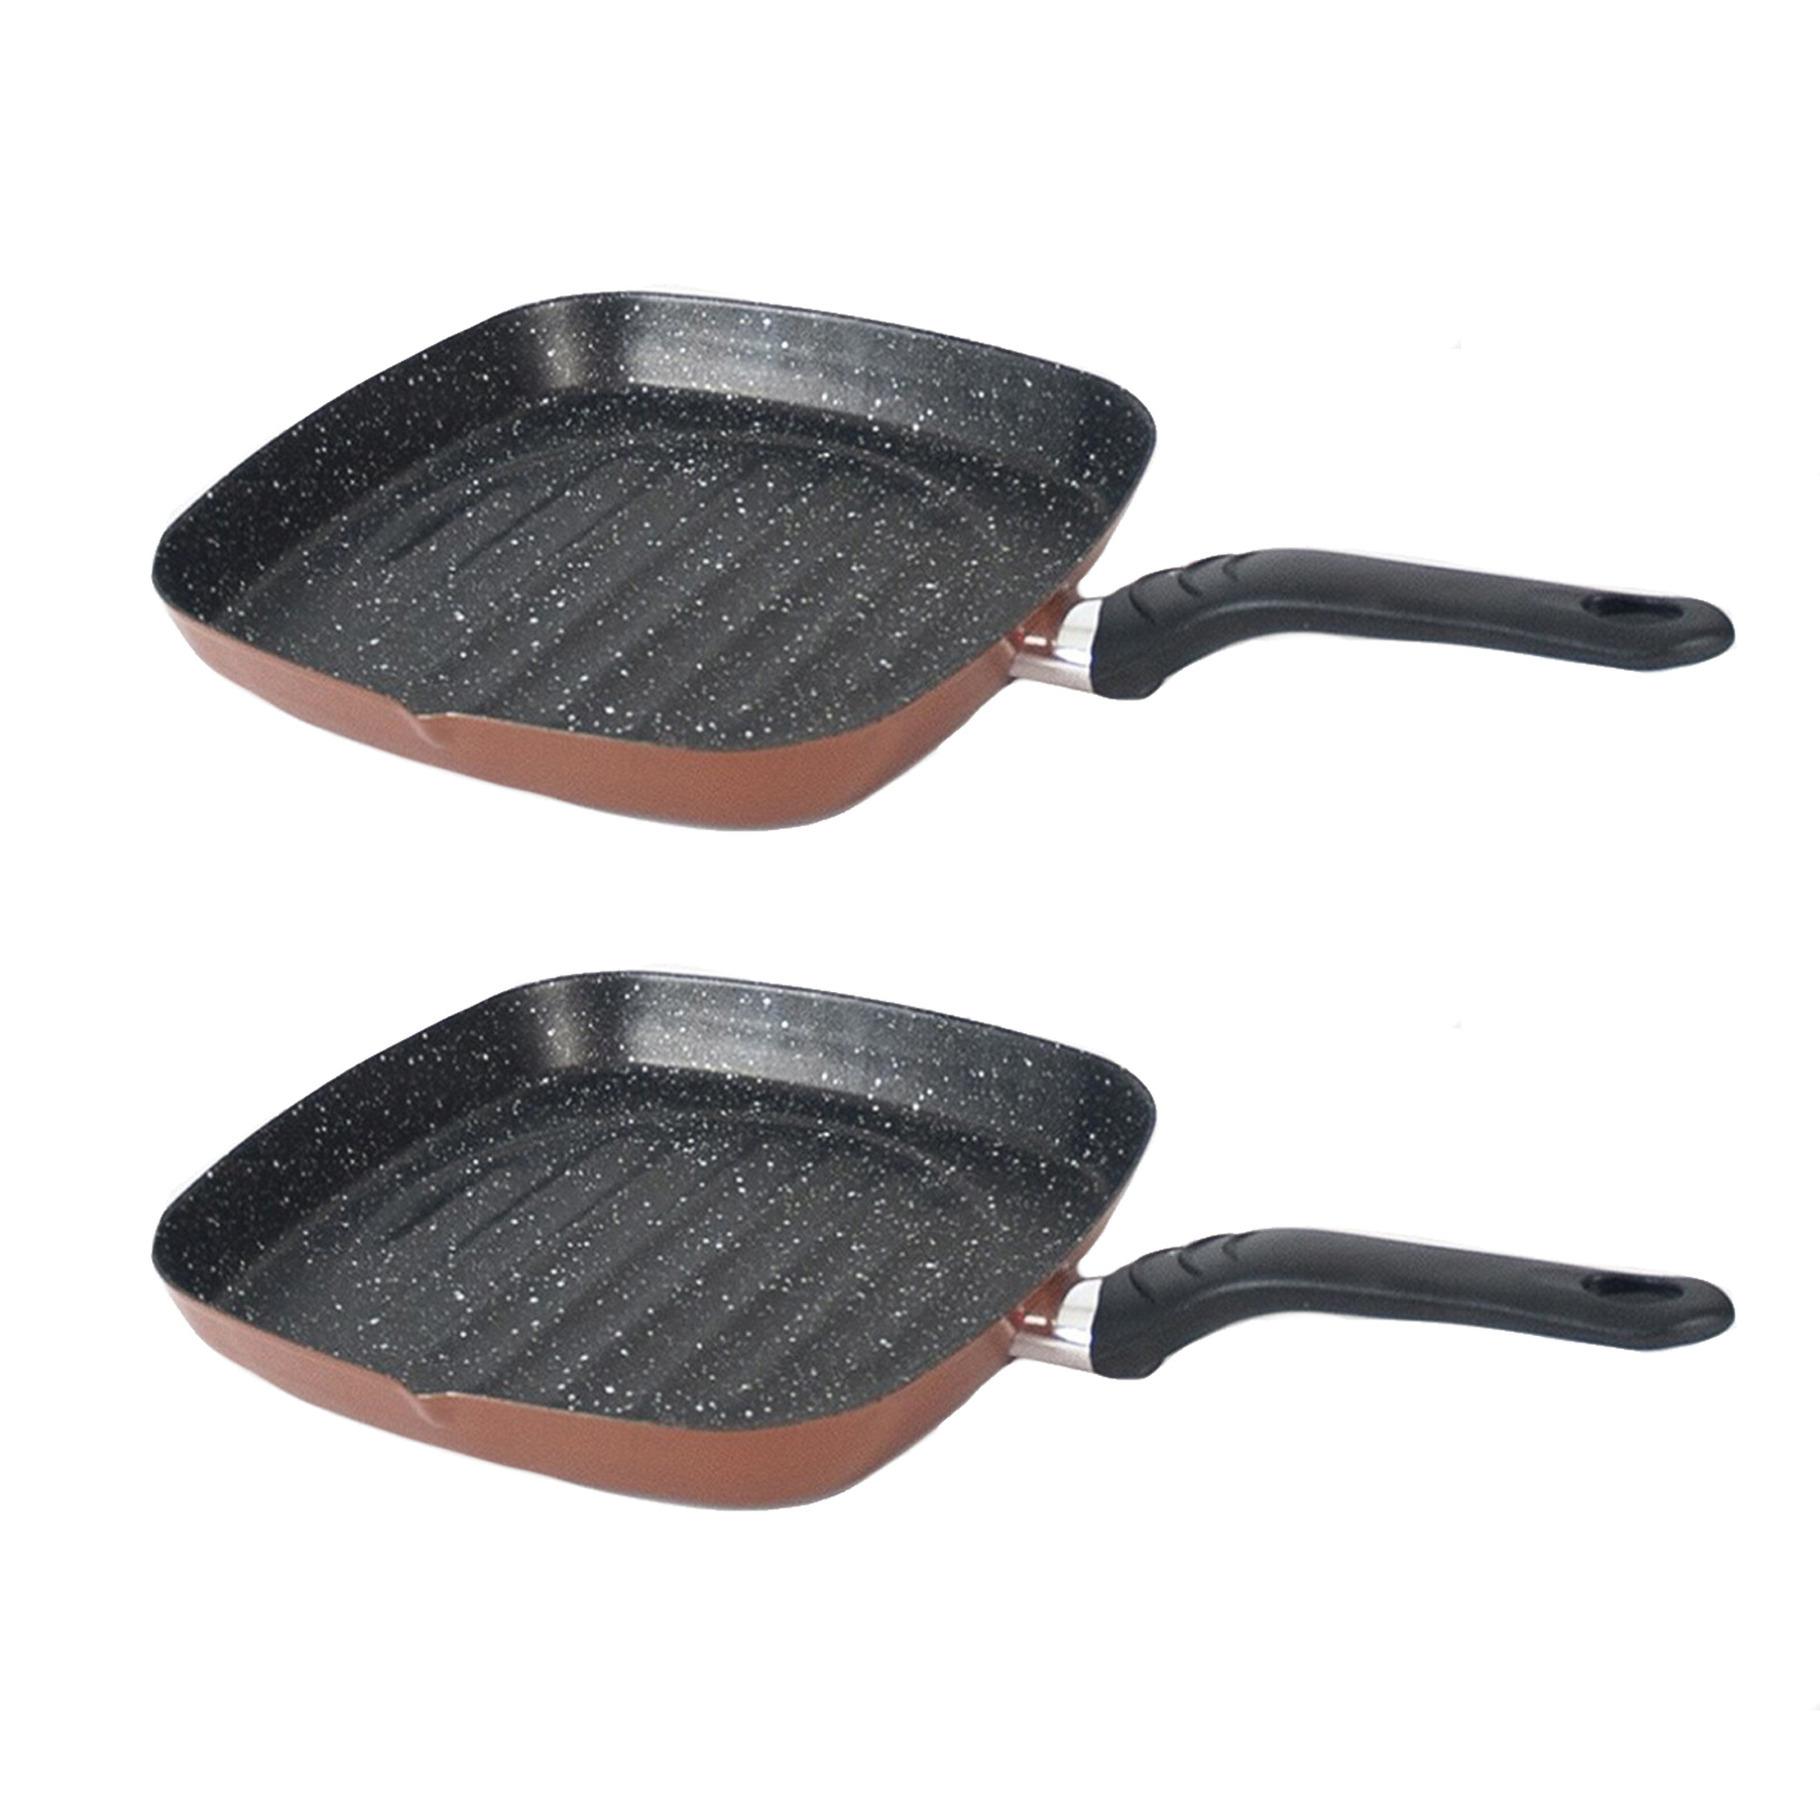 Set van 2x stuks aluminium grillpan burgos vierkant met anti aanbak laag 27 cm